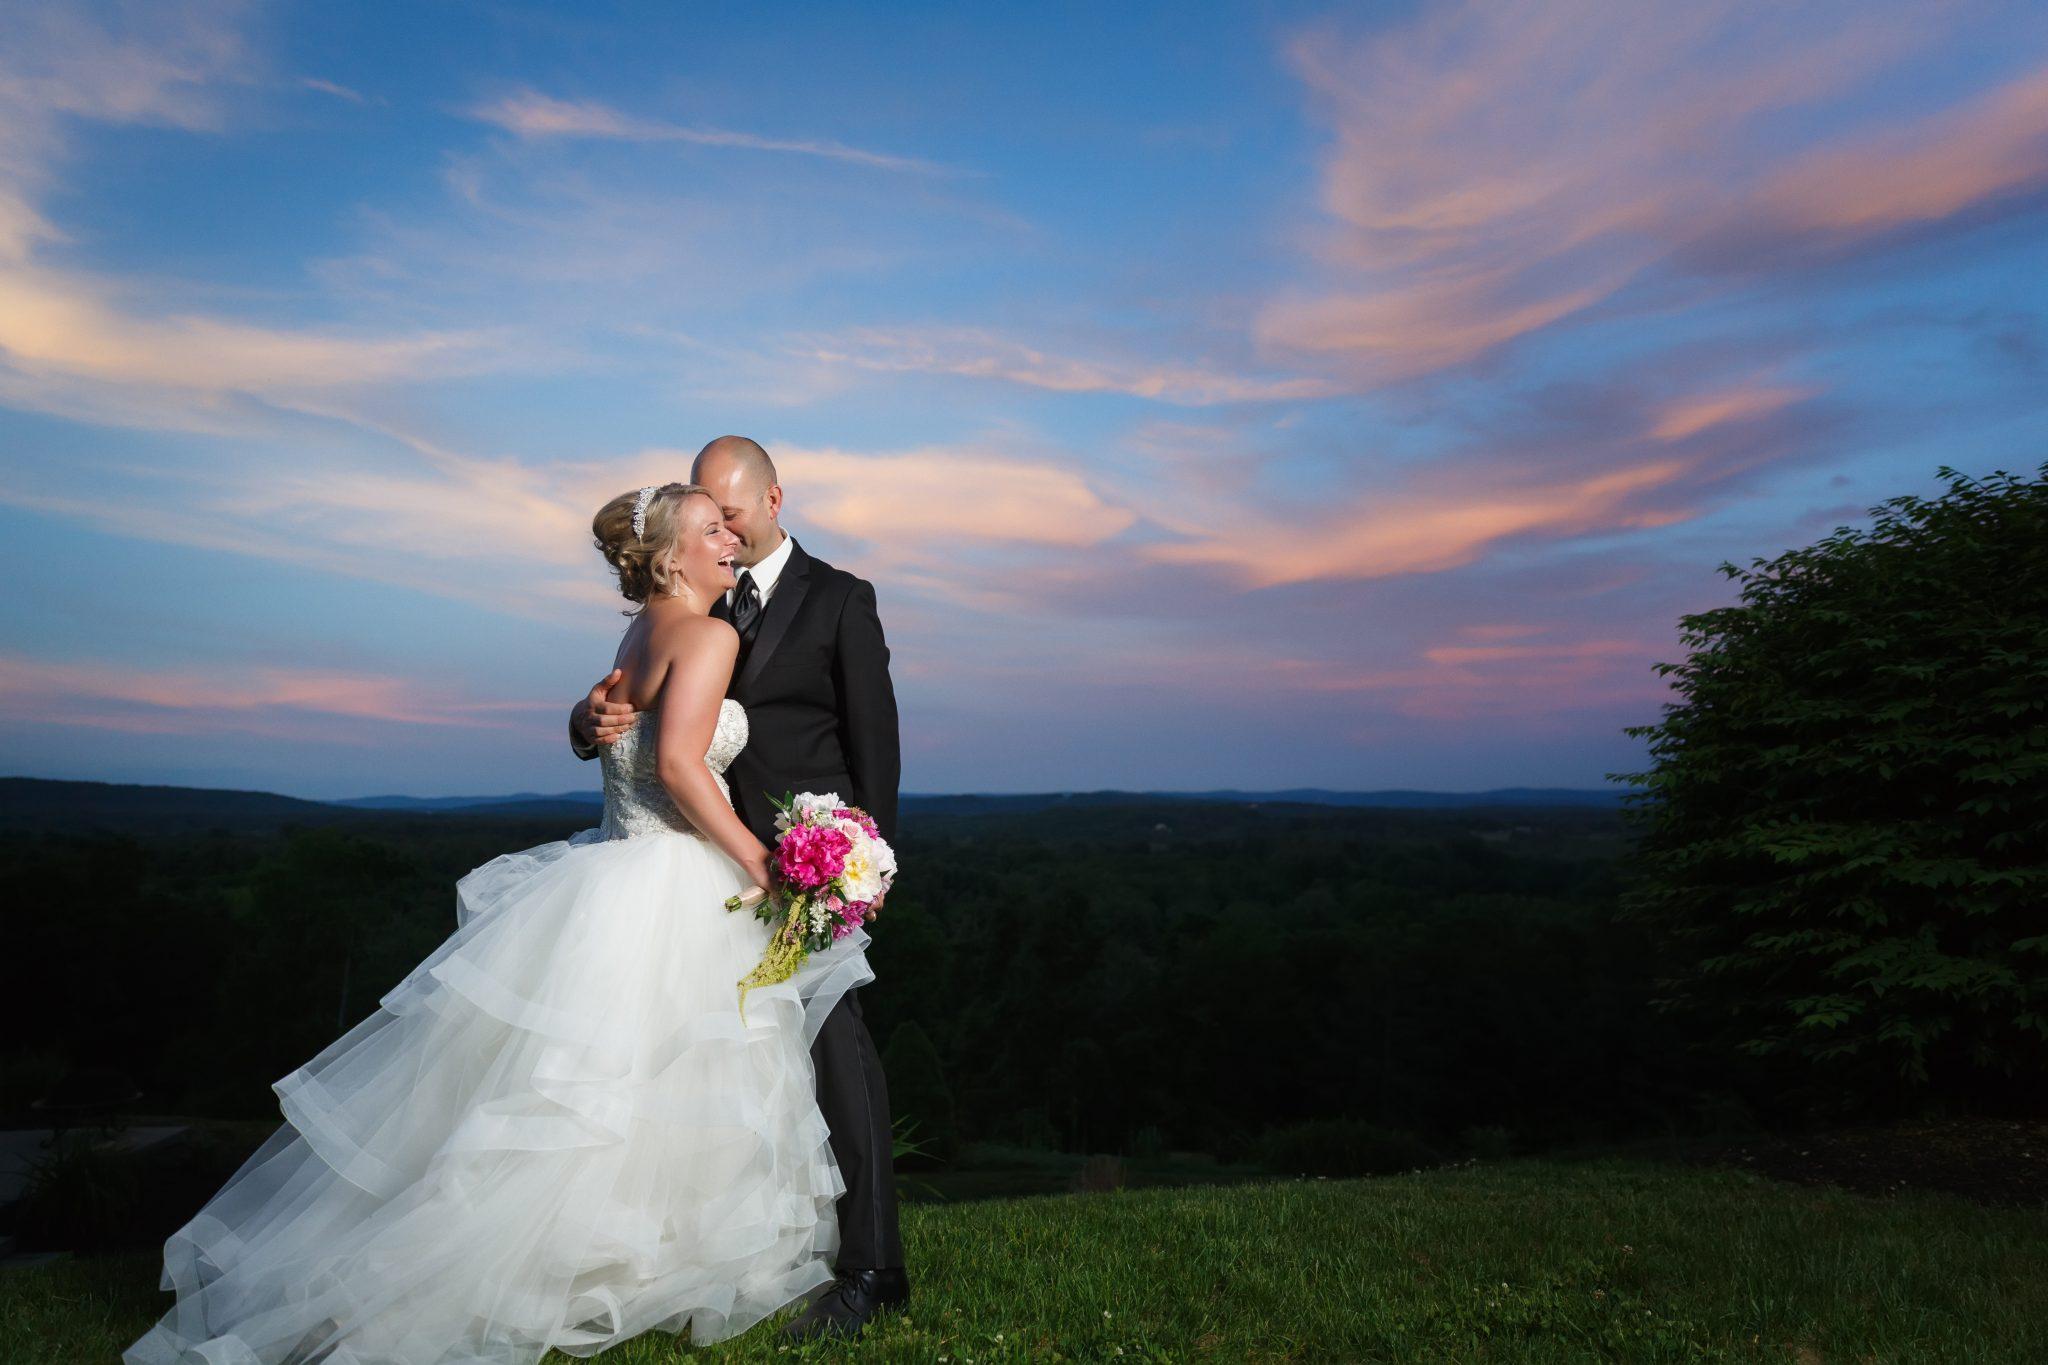 Beautiful bride and groom sunset photo